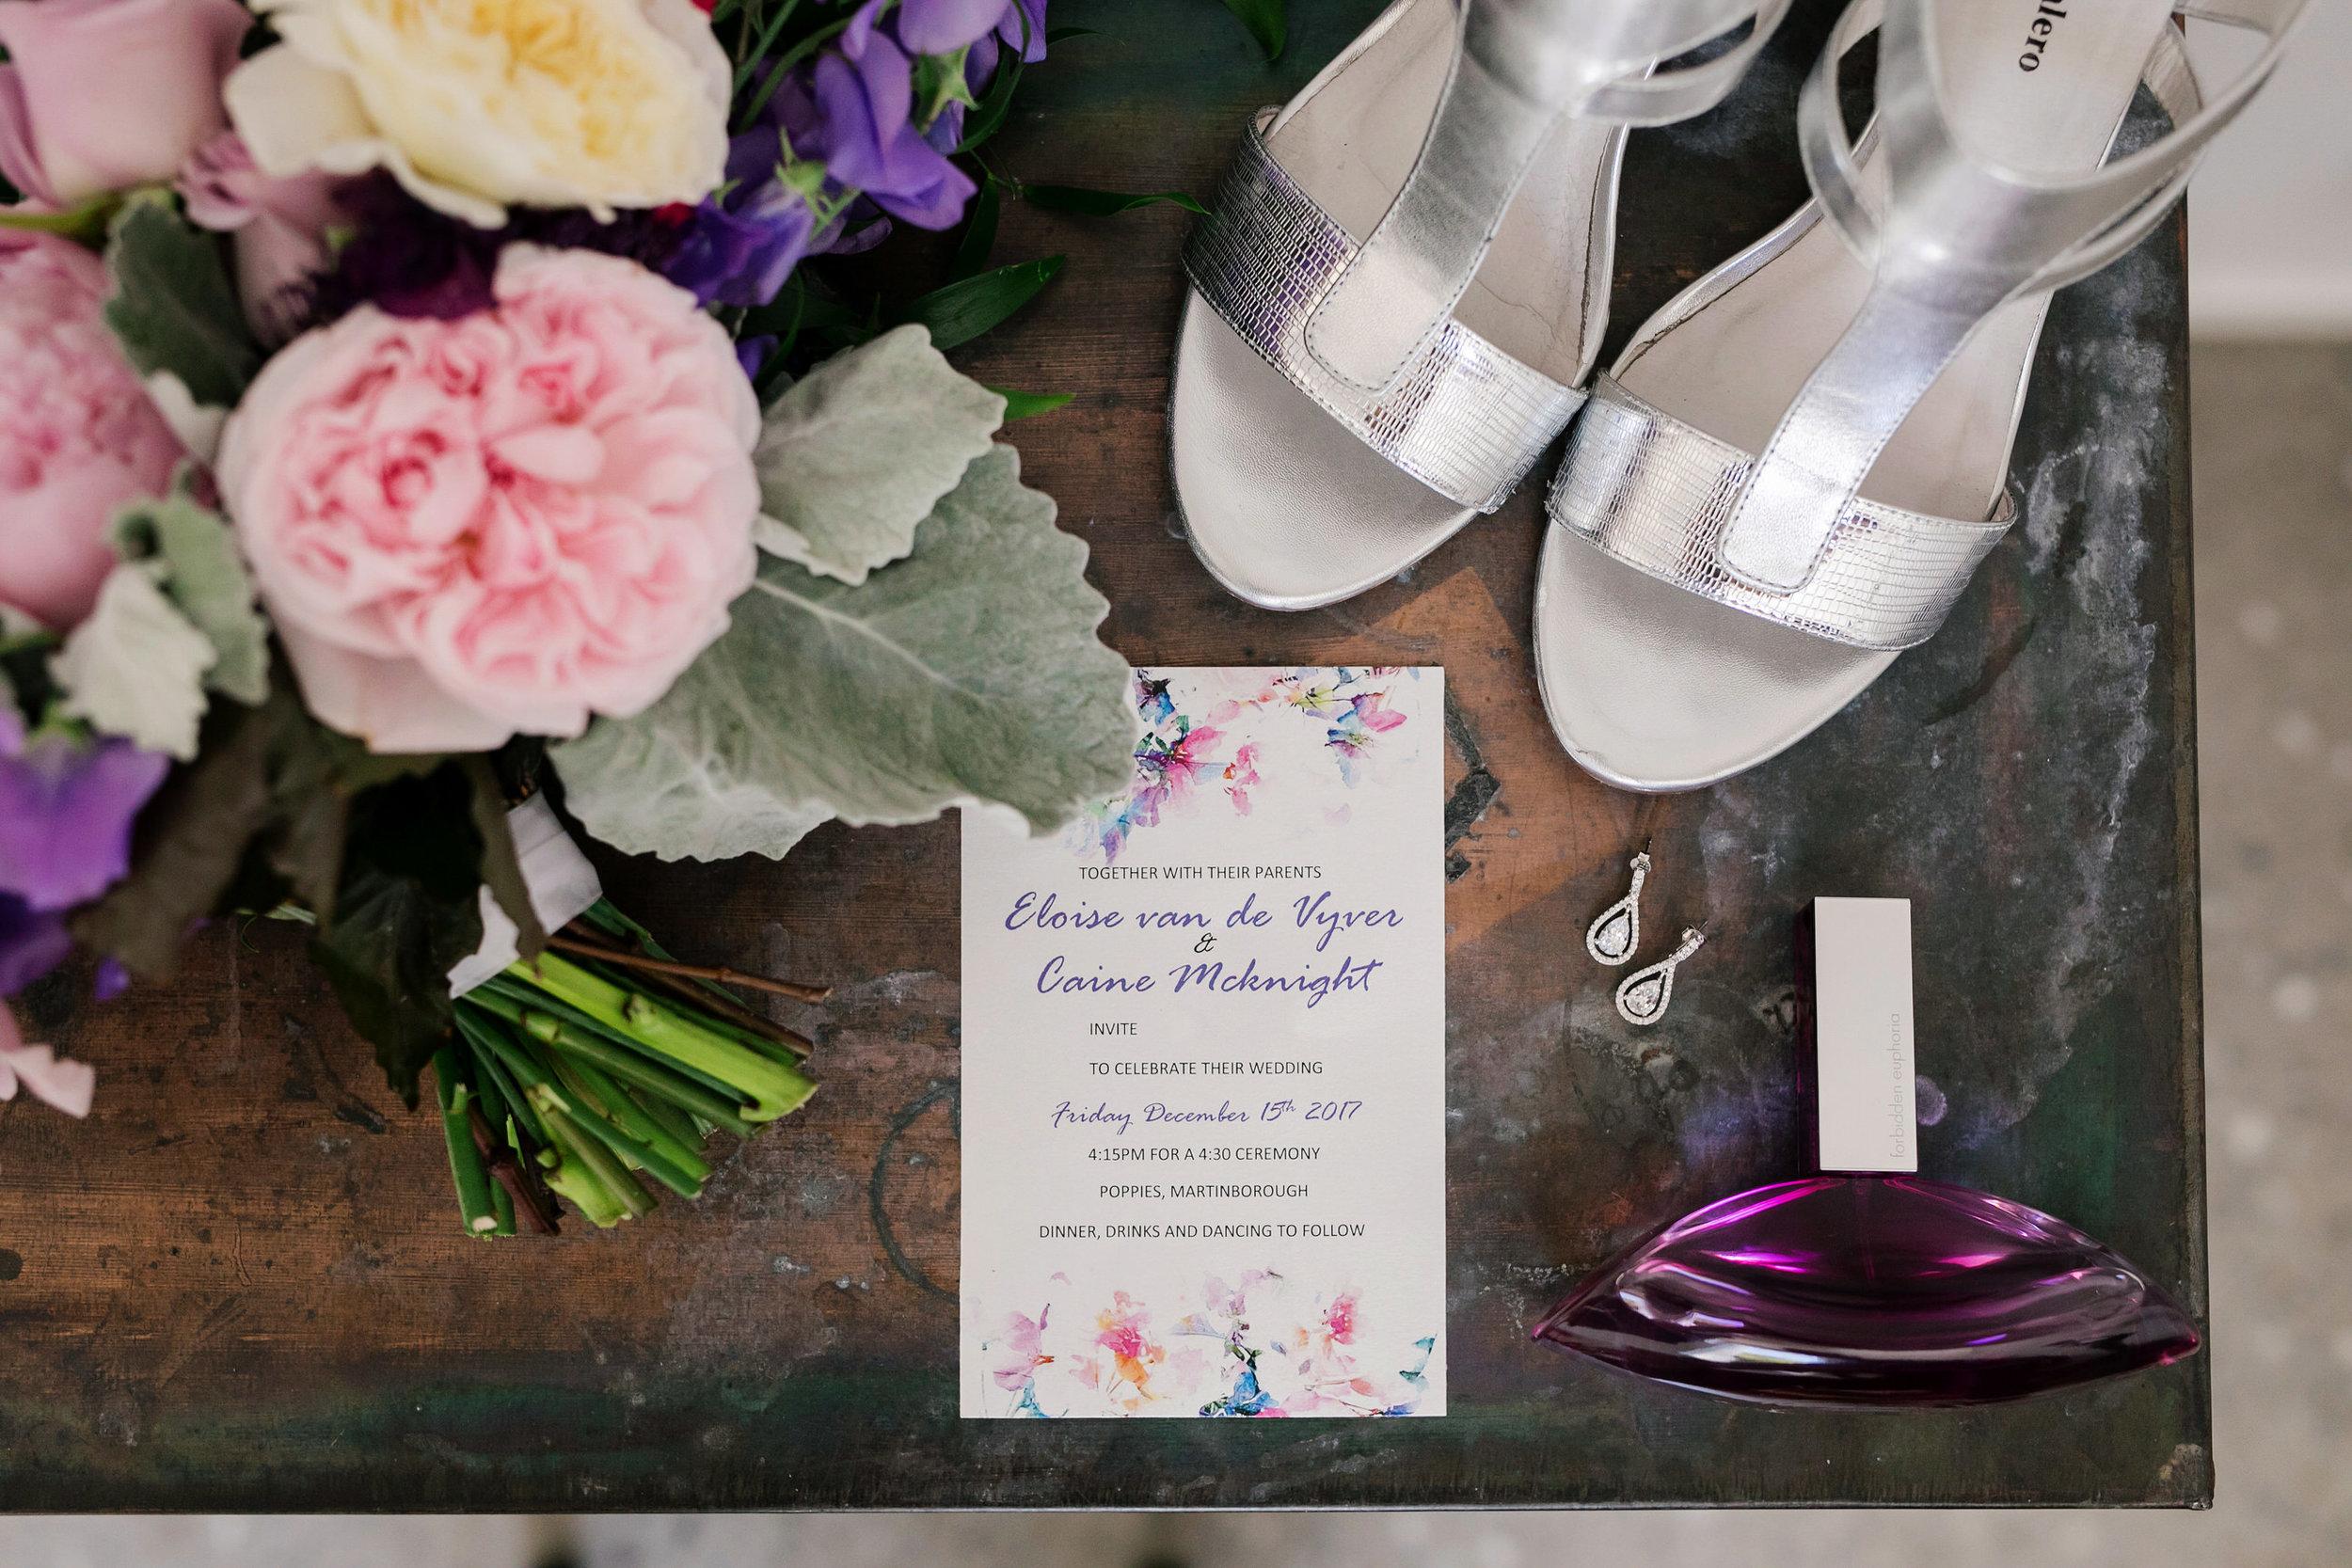 Martinborough-Poppies-Wedding-Caine-Eloise-Toni-Larsen-0007.jpg